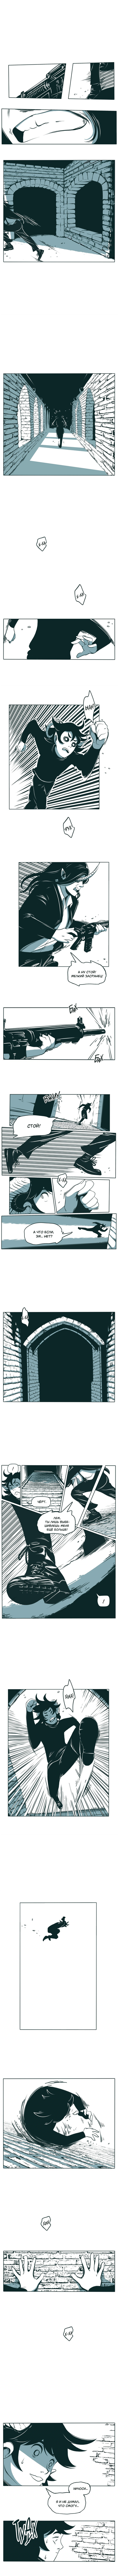 https://r1.ninemanga.com/comics/pic2/0/33536/420922/1534437756682.jpg Page 2